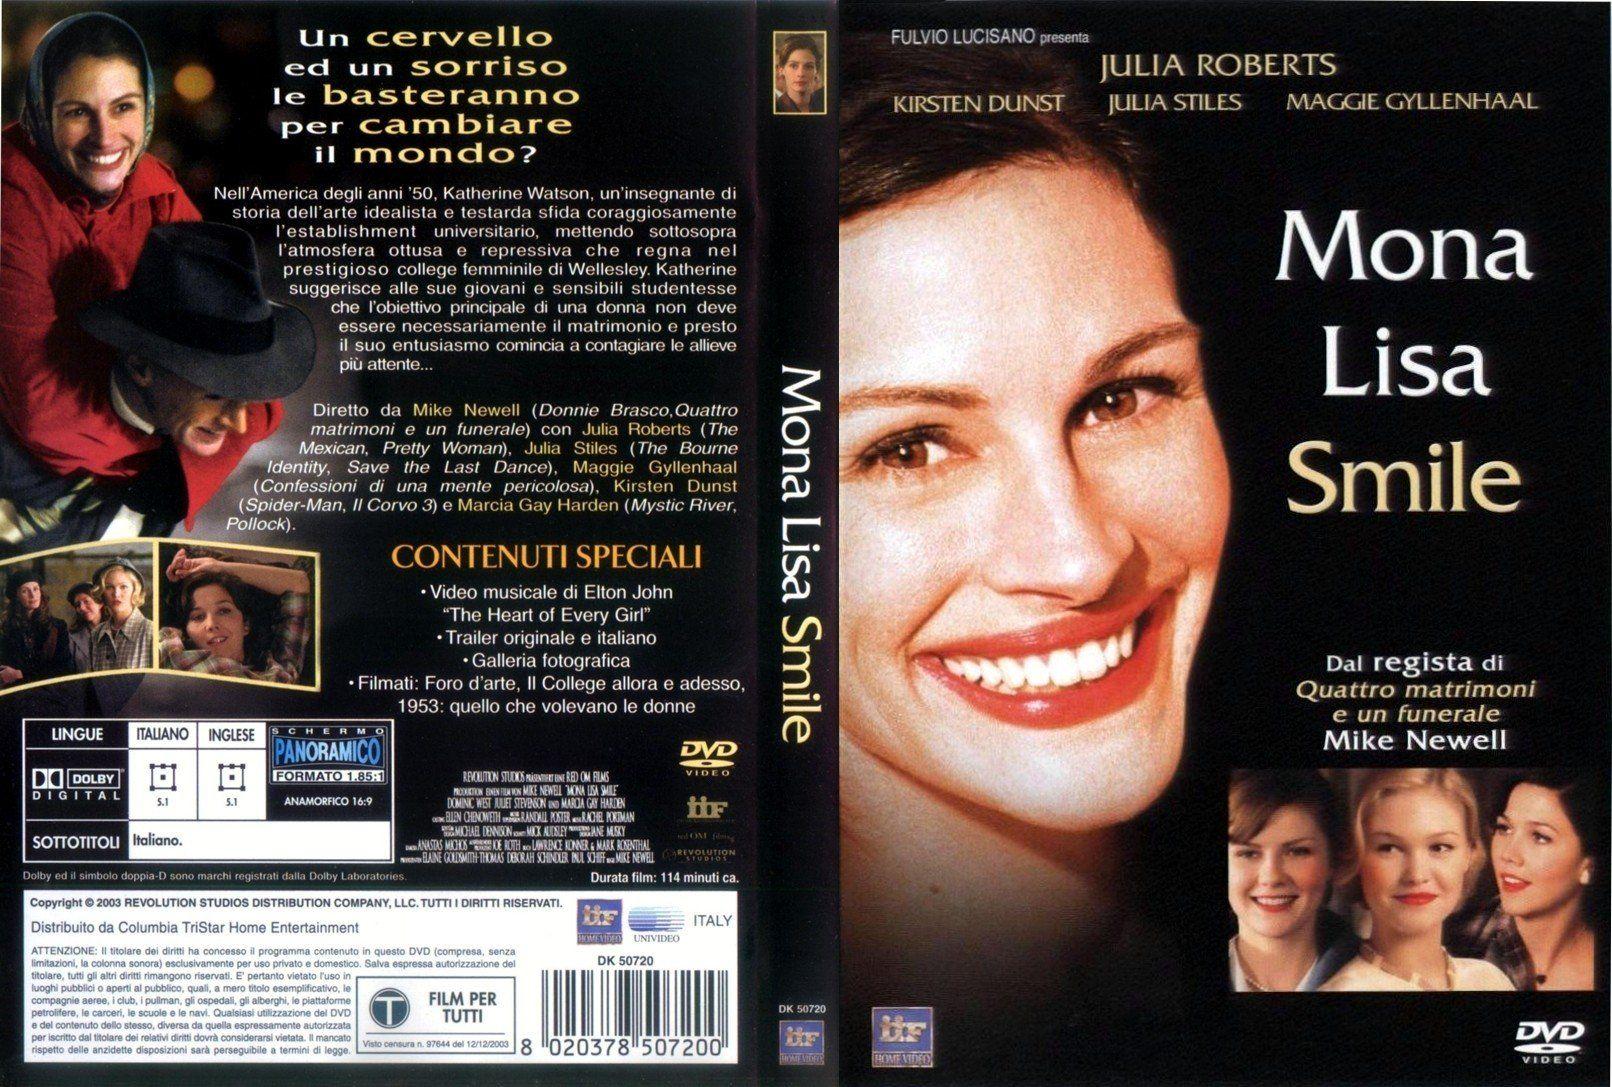 Mona Lisa Smile About Time Movie Mona Lisa Smile Good Movies